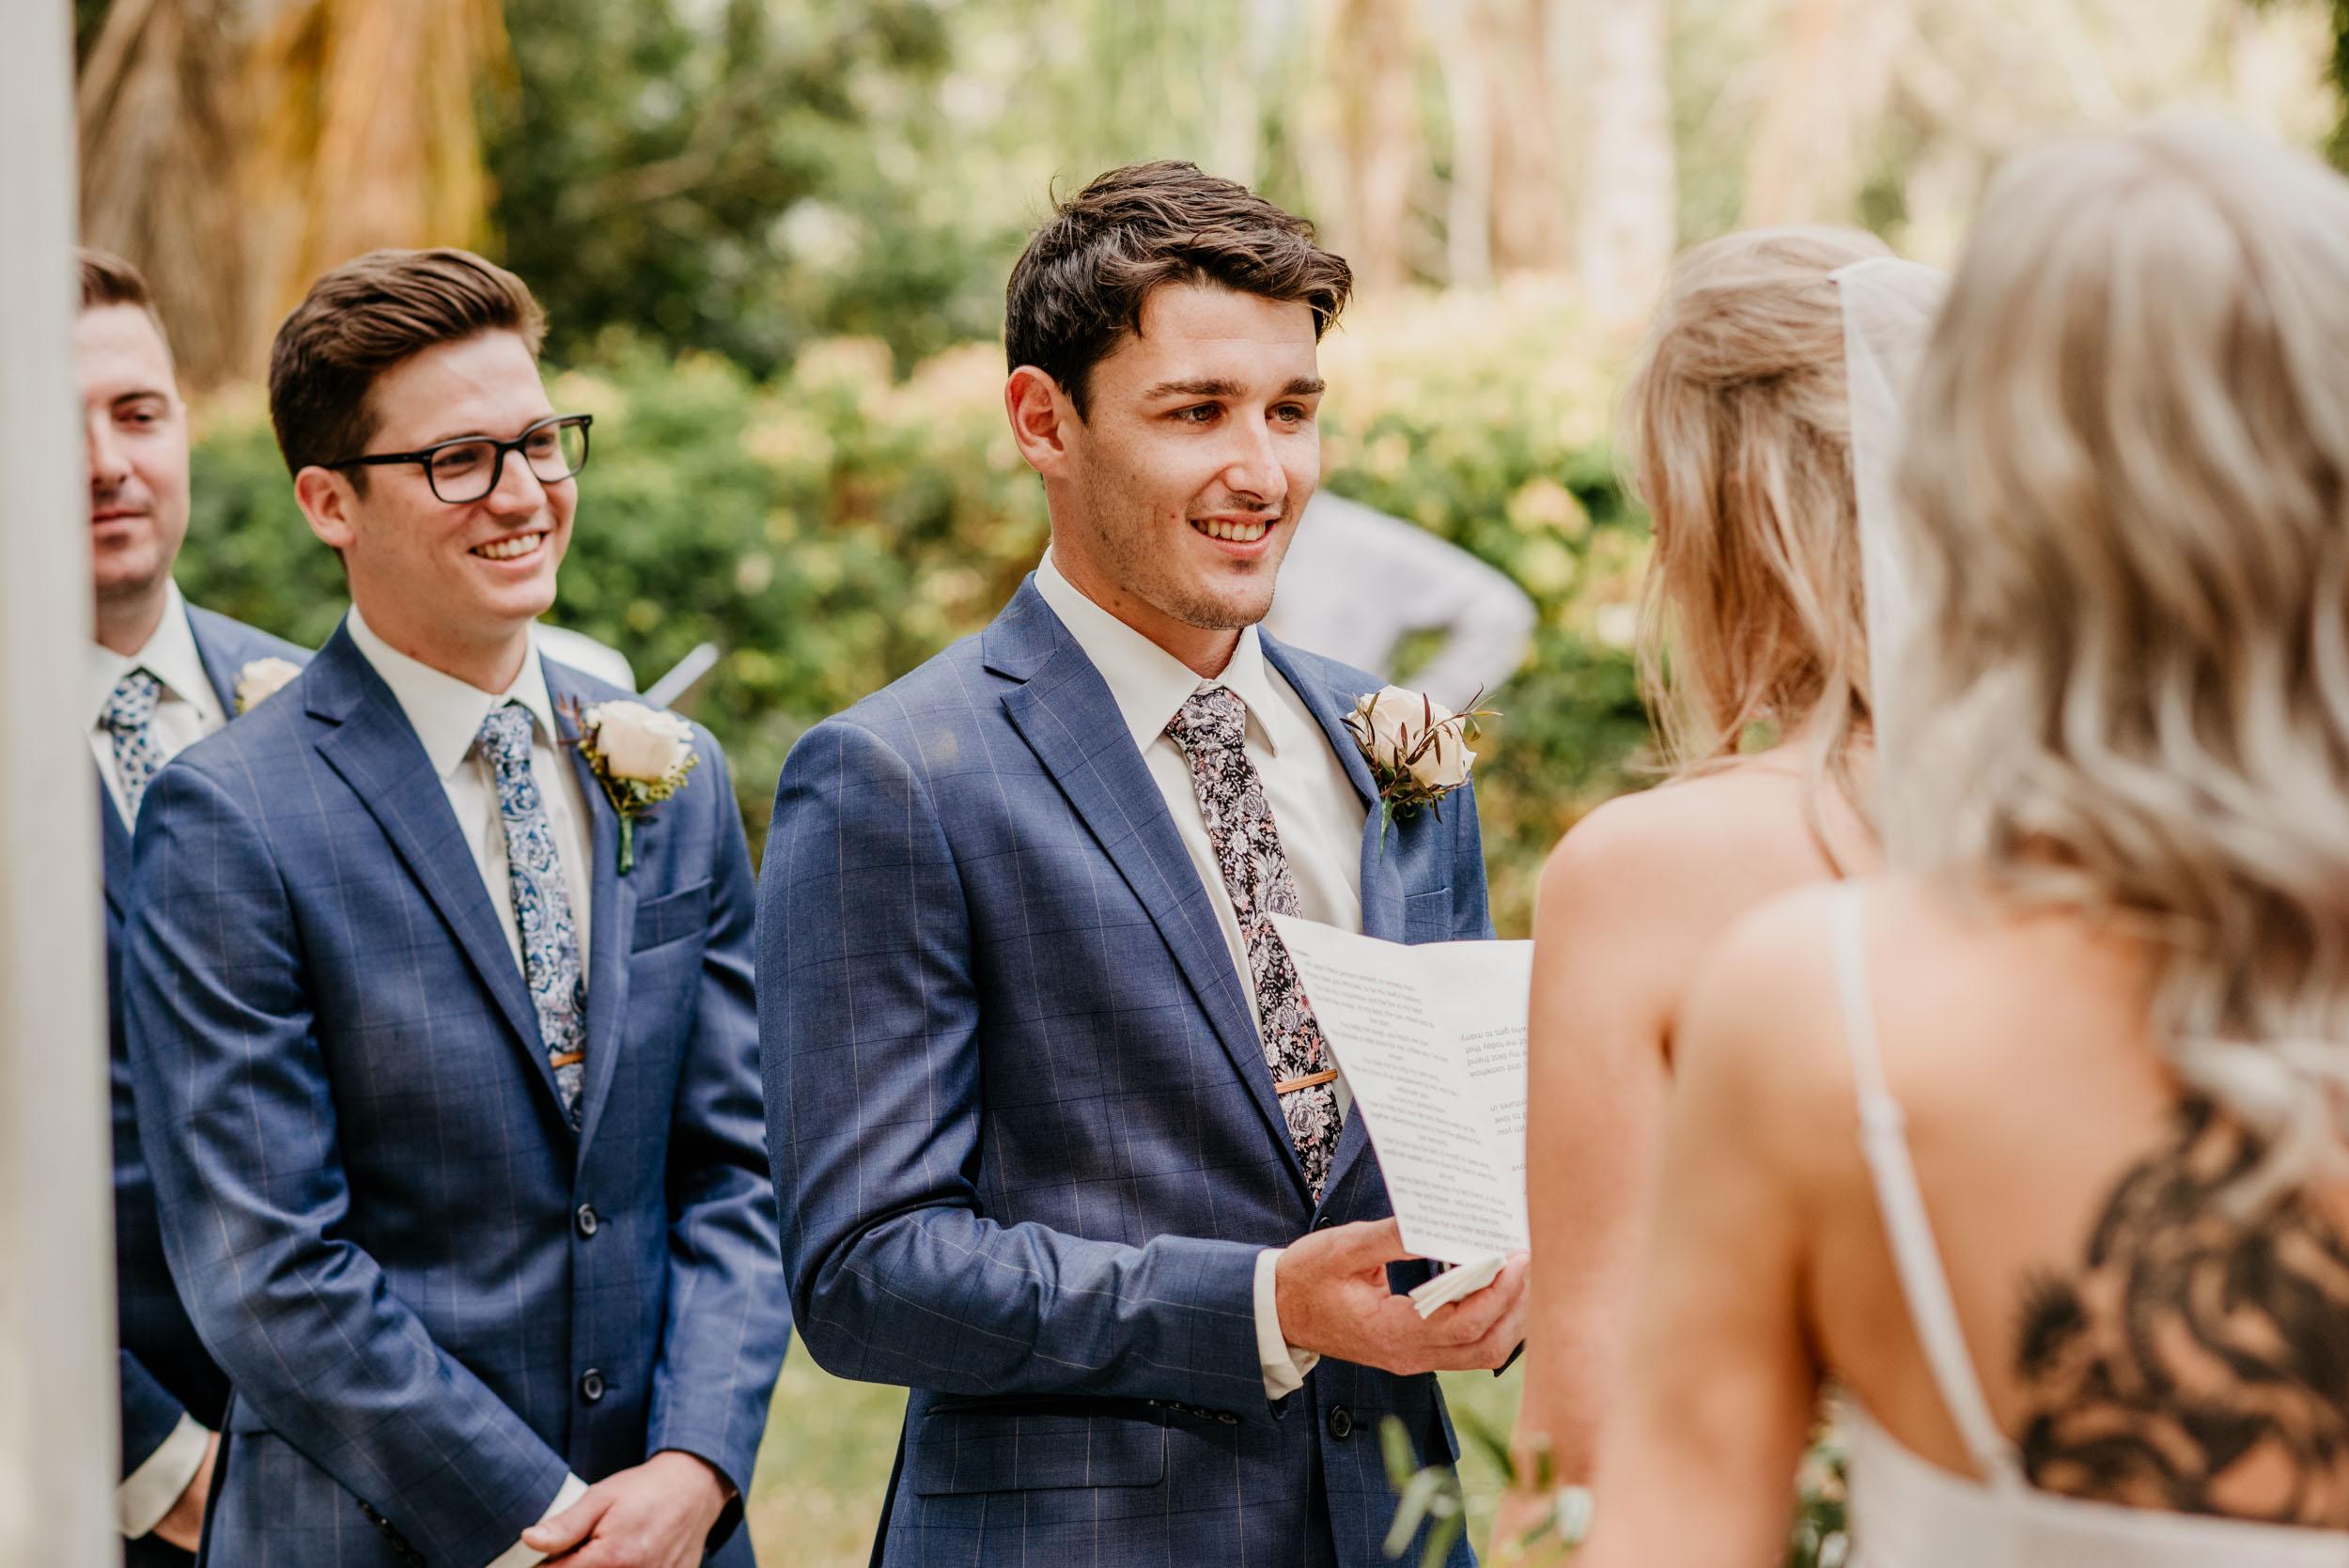 The Raw Photographer - Cairns Wedding Photographer - Laloli - Cairns Garden Wedding - Wedding Dress-38.jpg